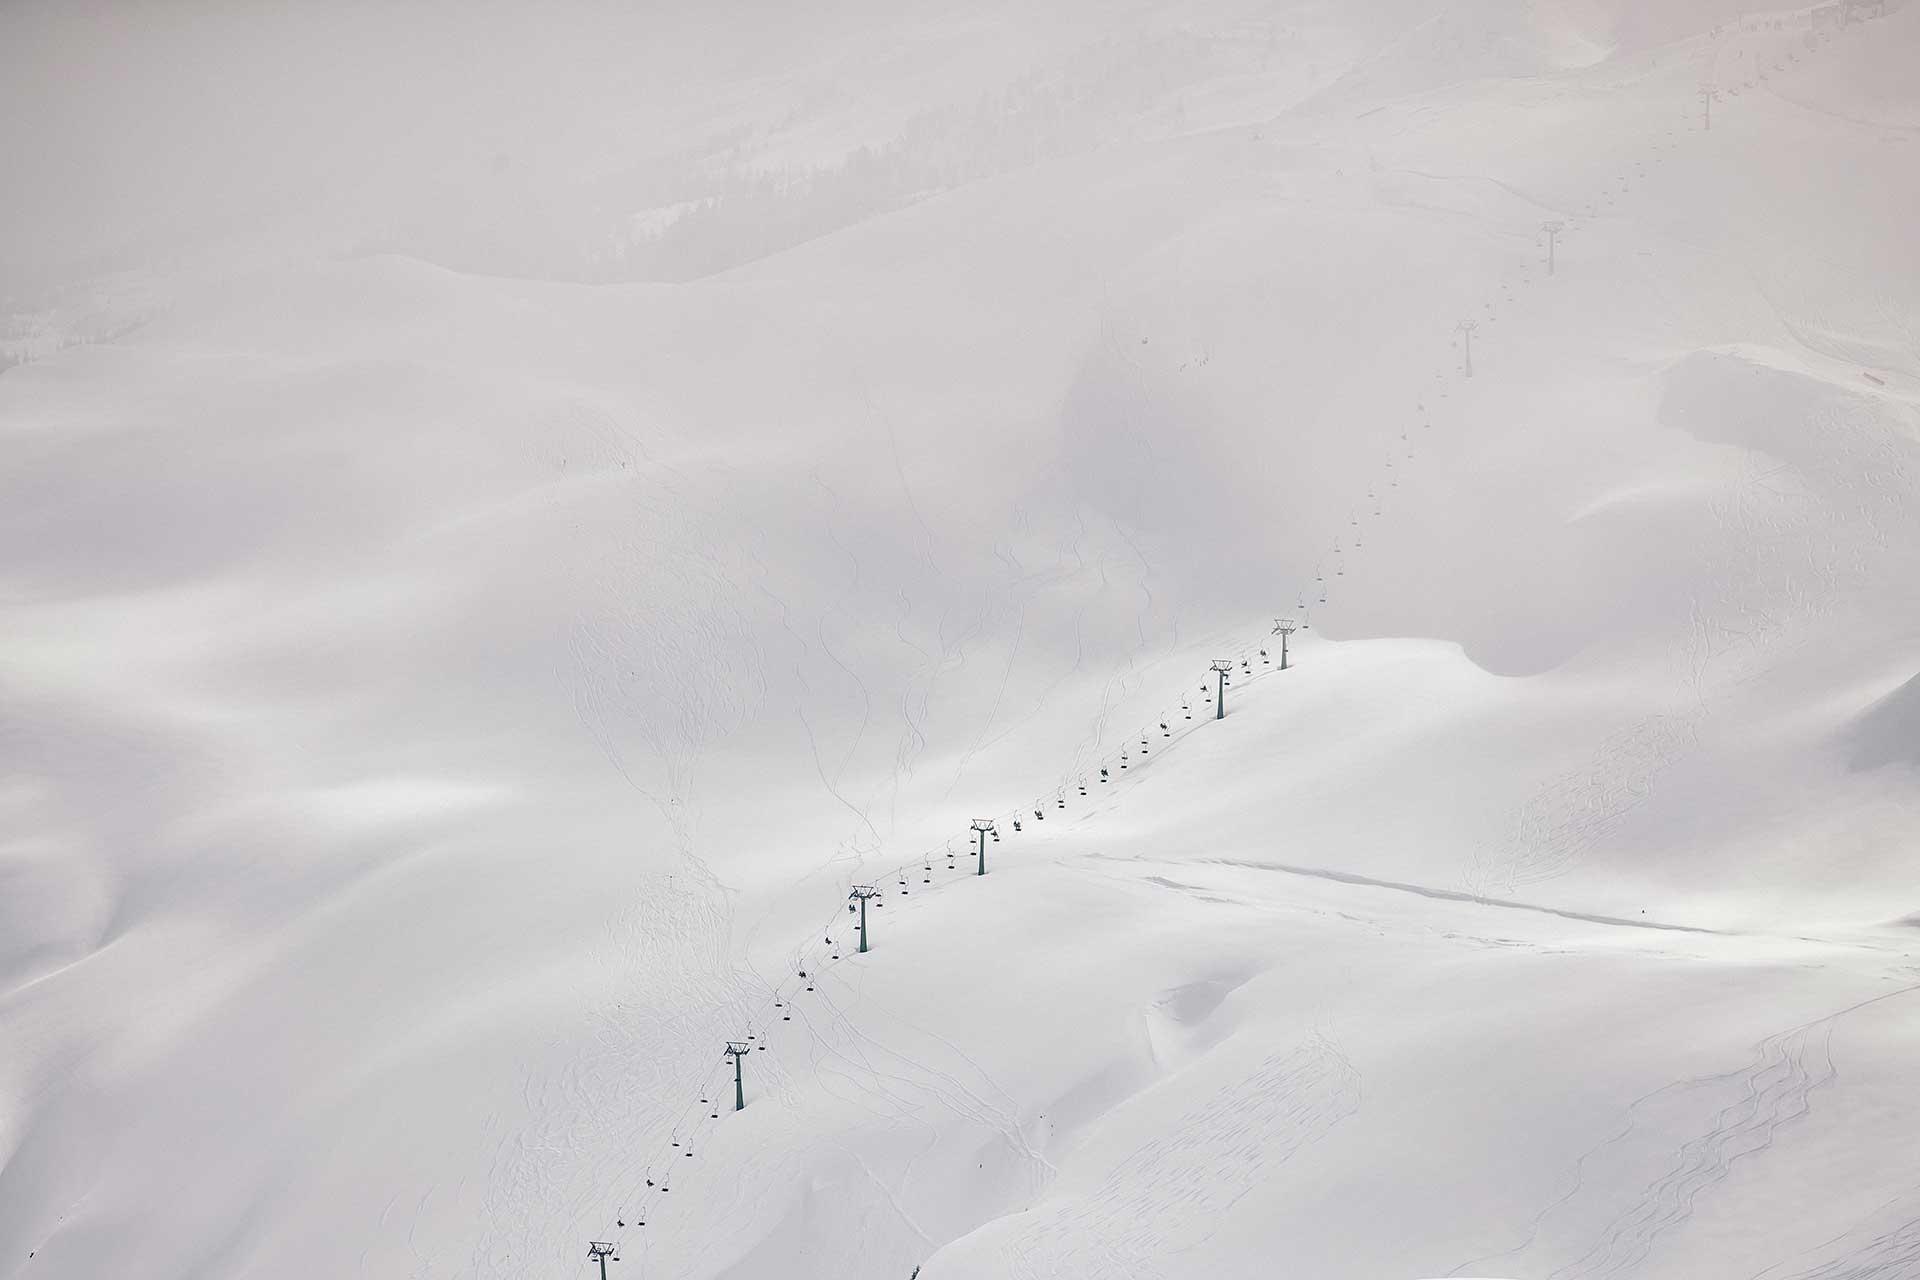 Skilift Tiefschnee Winter Sportfotograf Aktion Berlin Michael Müller